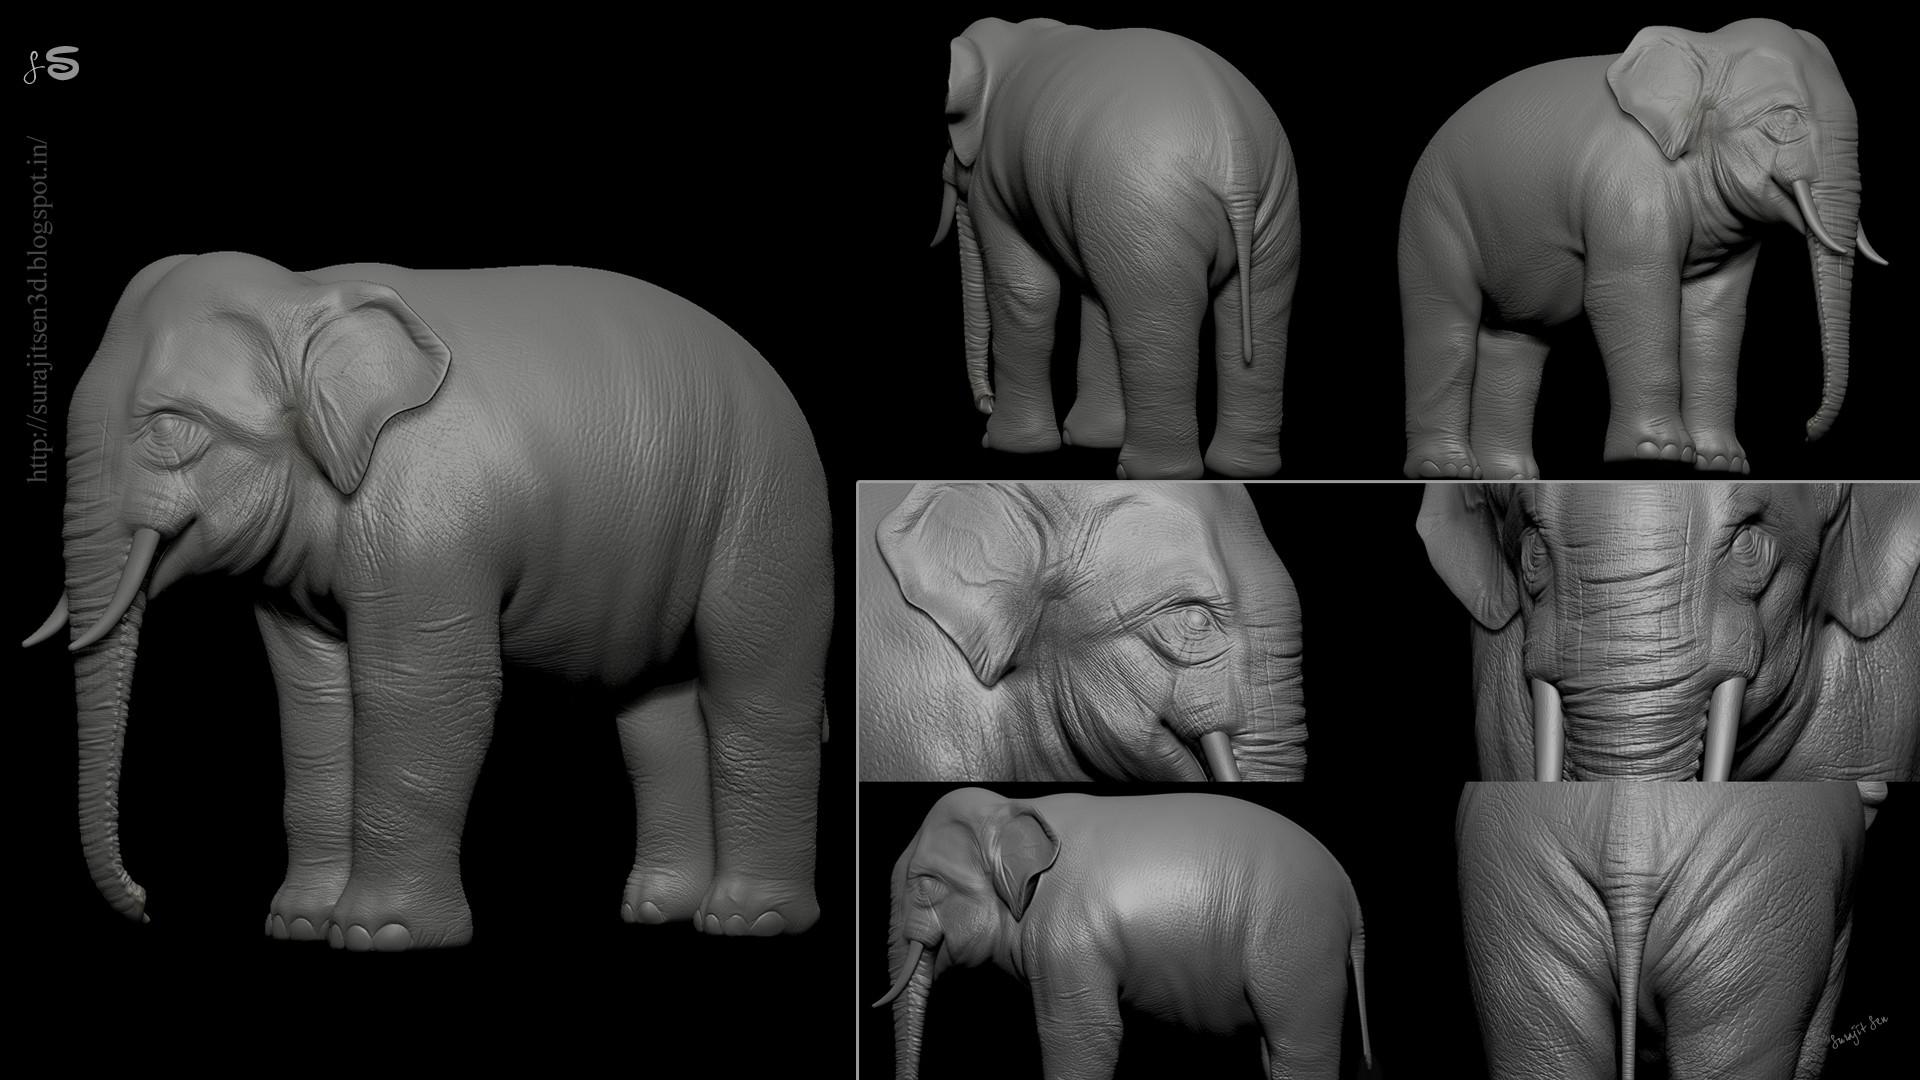 Surajit sen asian elephant surajit sen wip